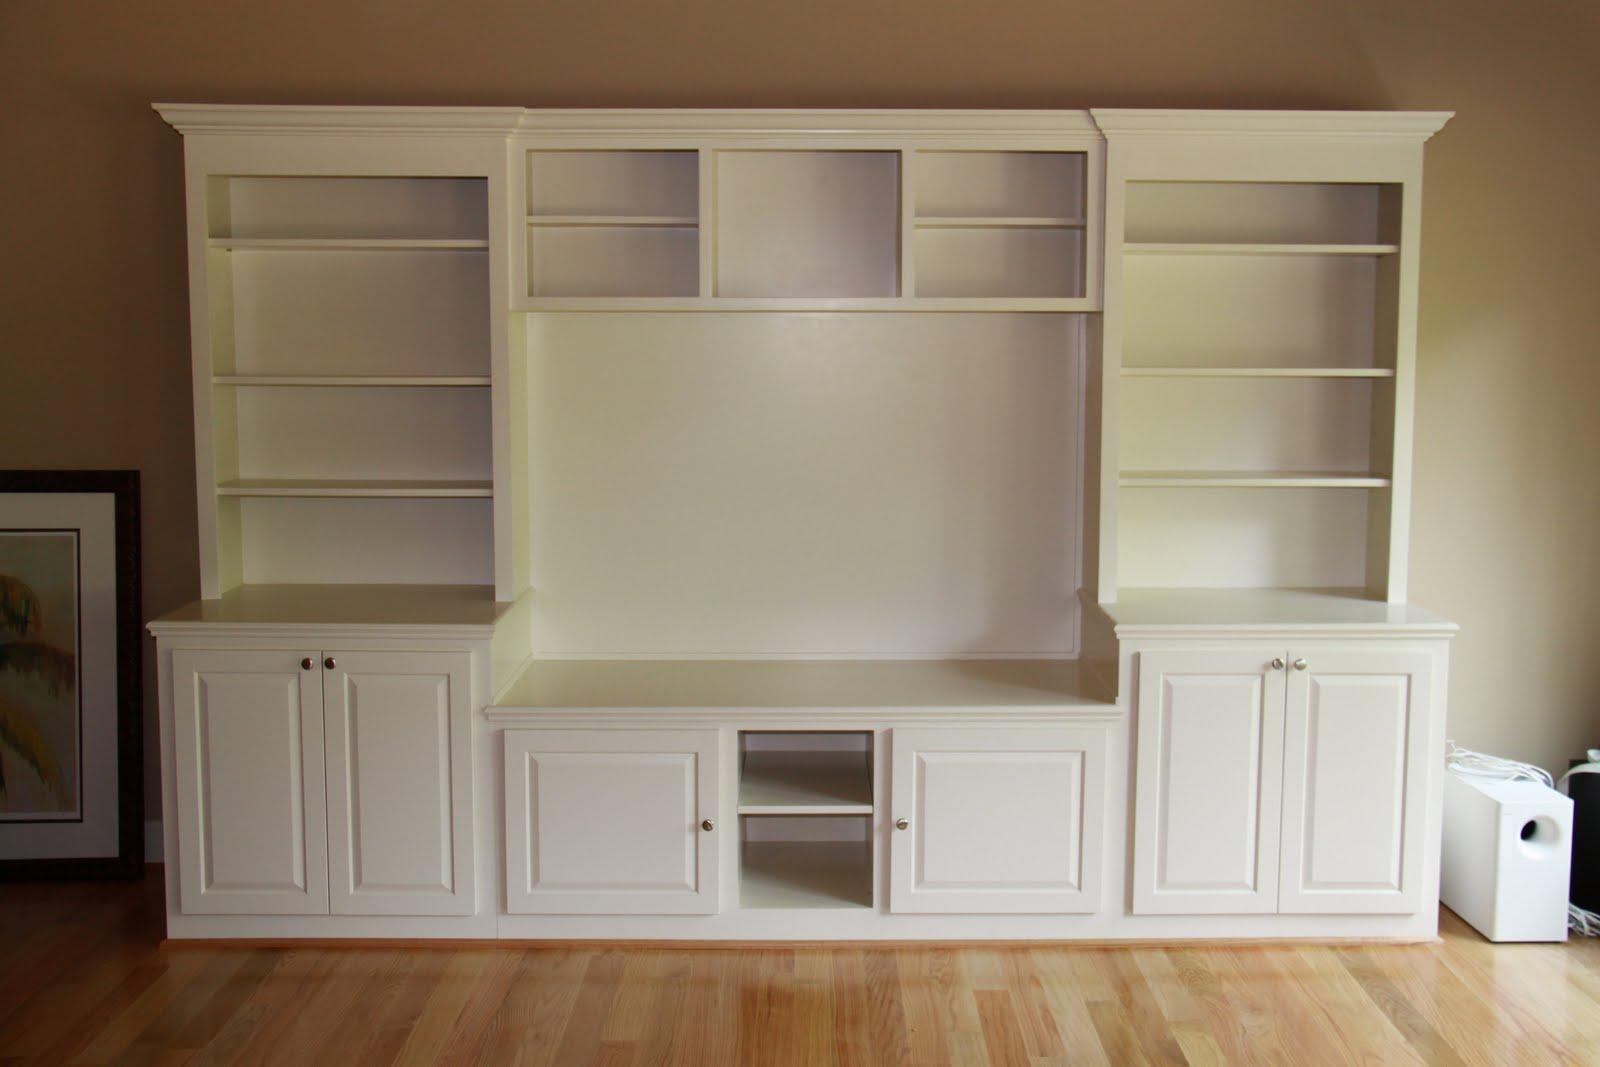 Bedroom Built In Wall Units | Bedroom Furniture High ...